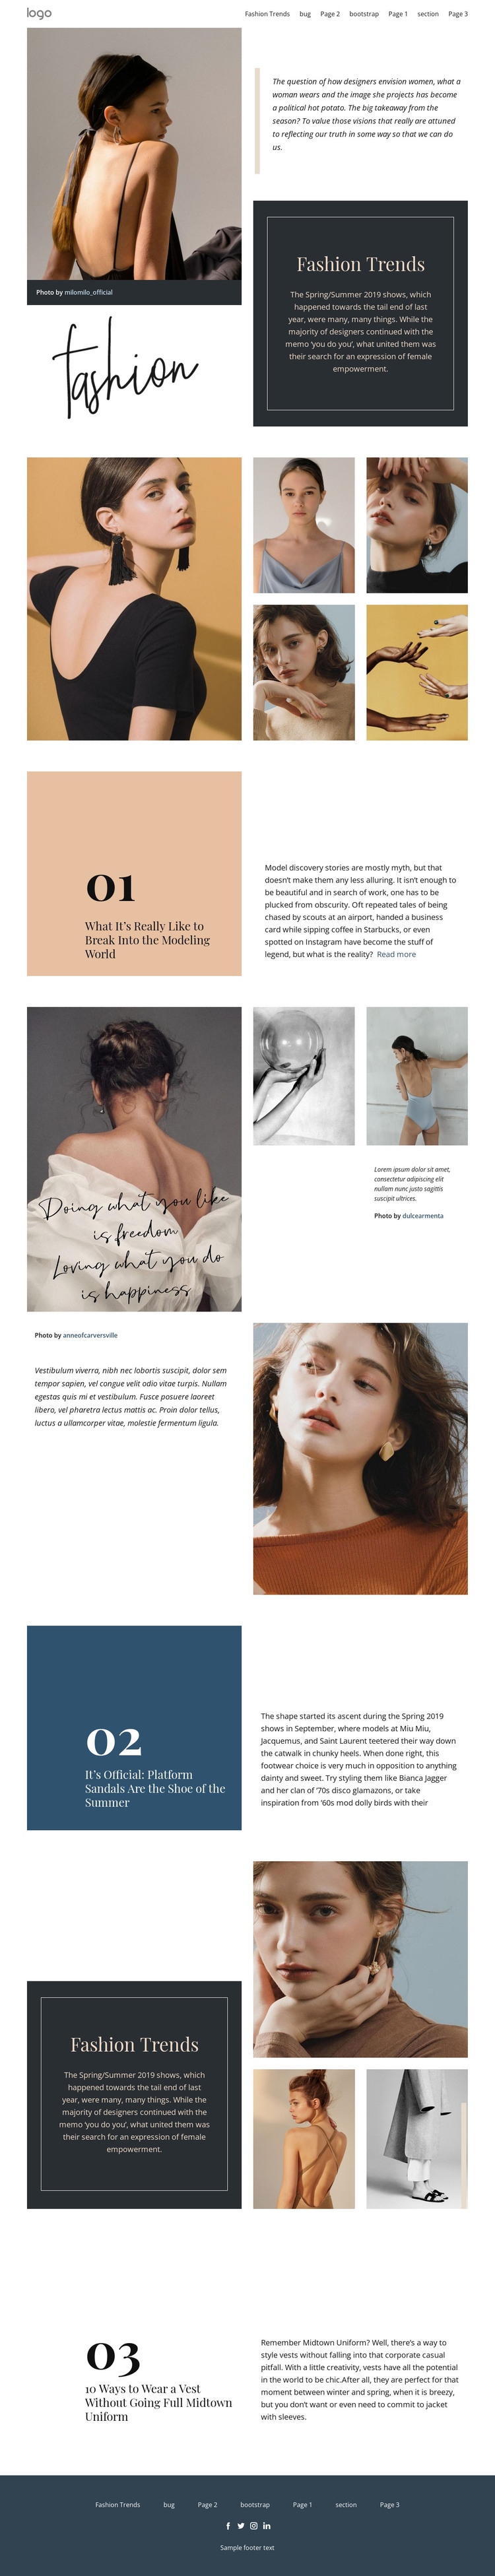 Designer vision of fashion WordPress Theme